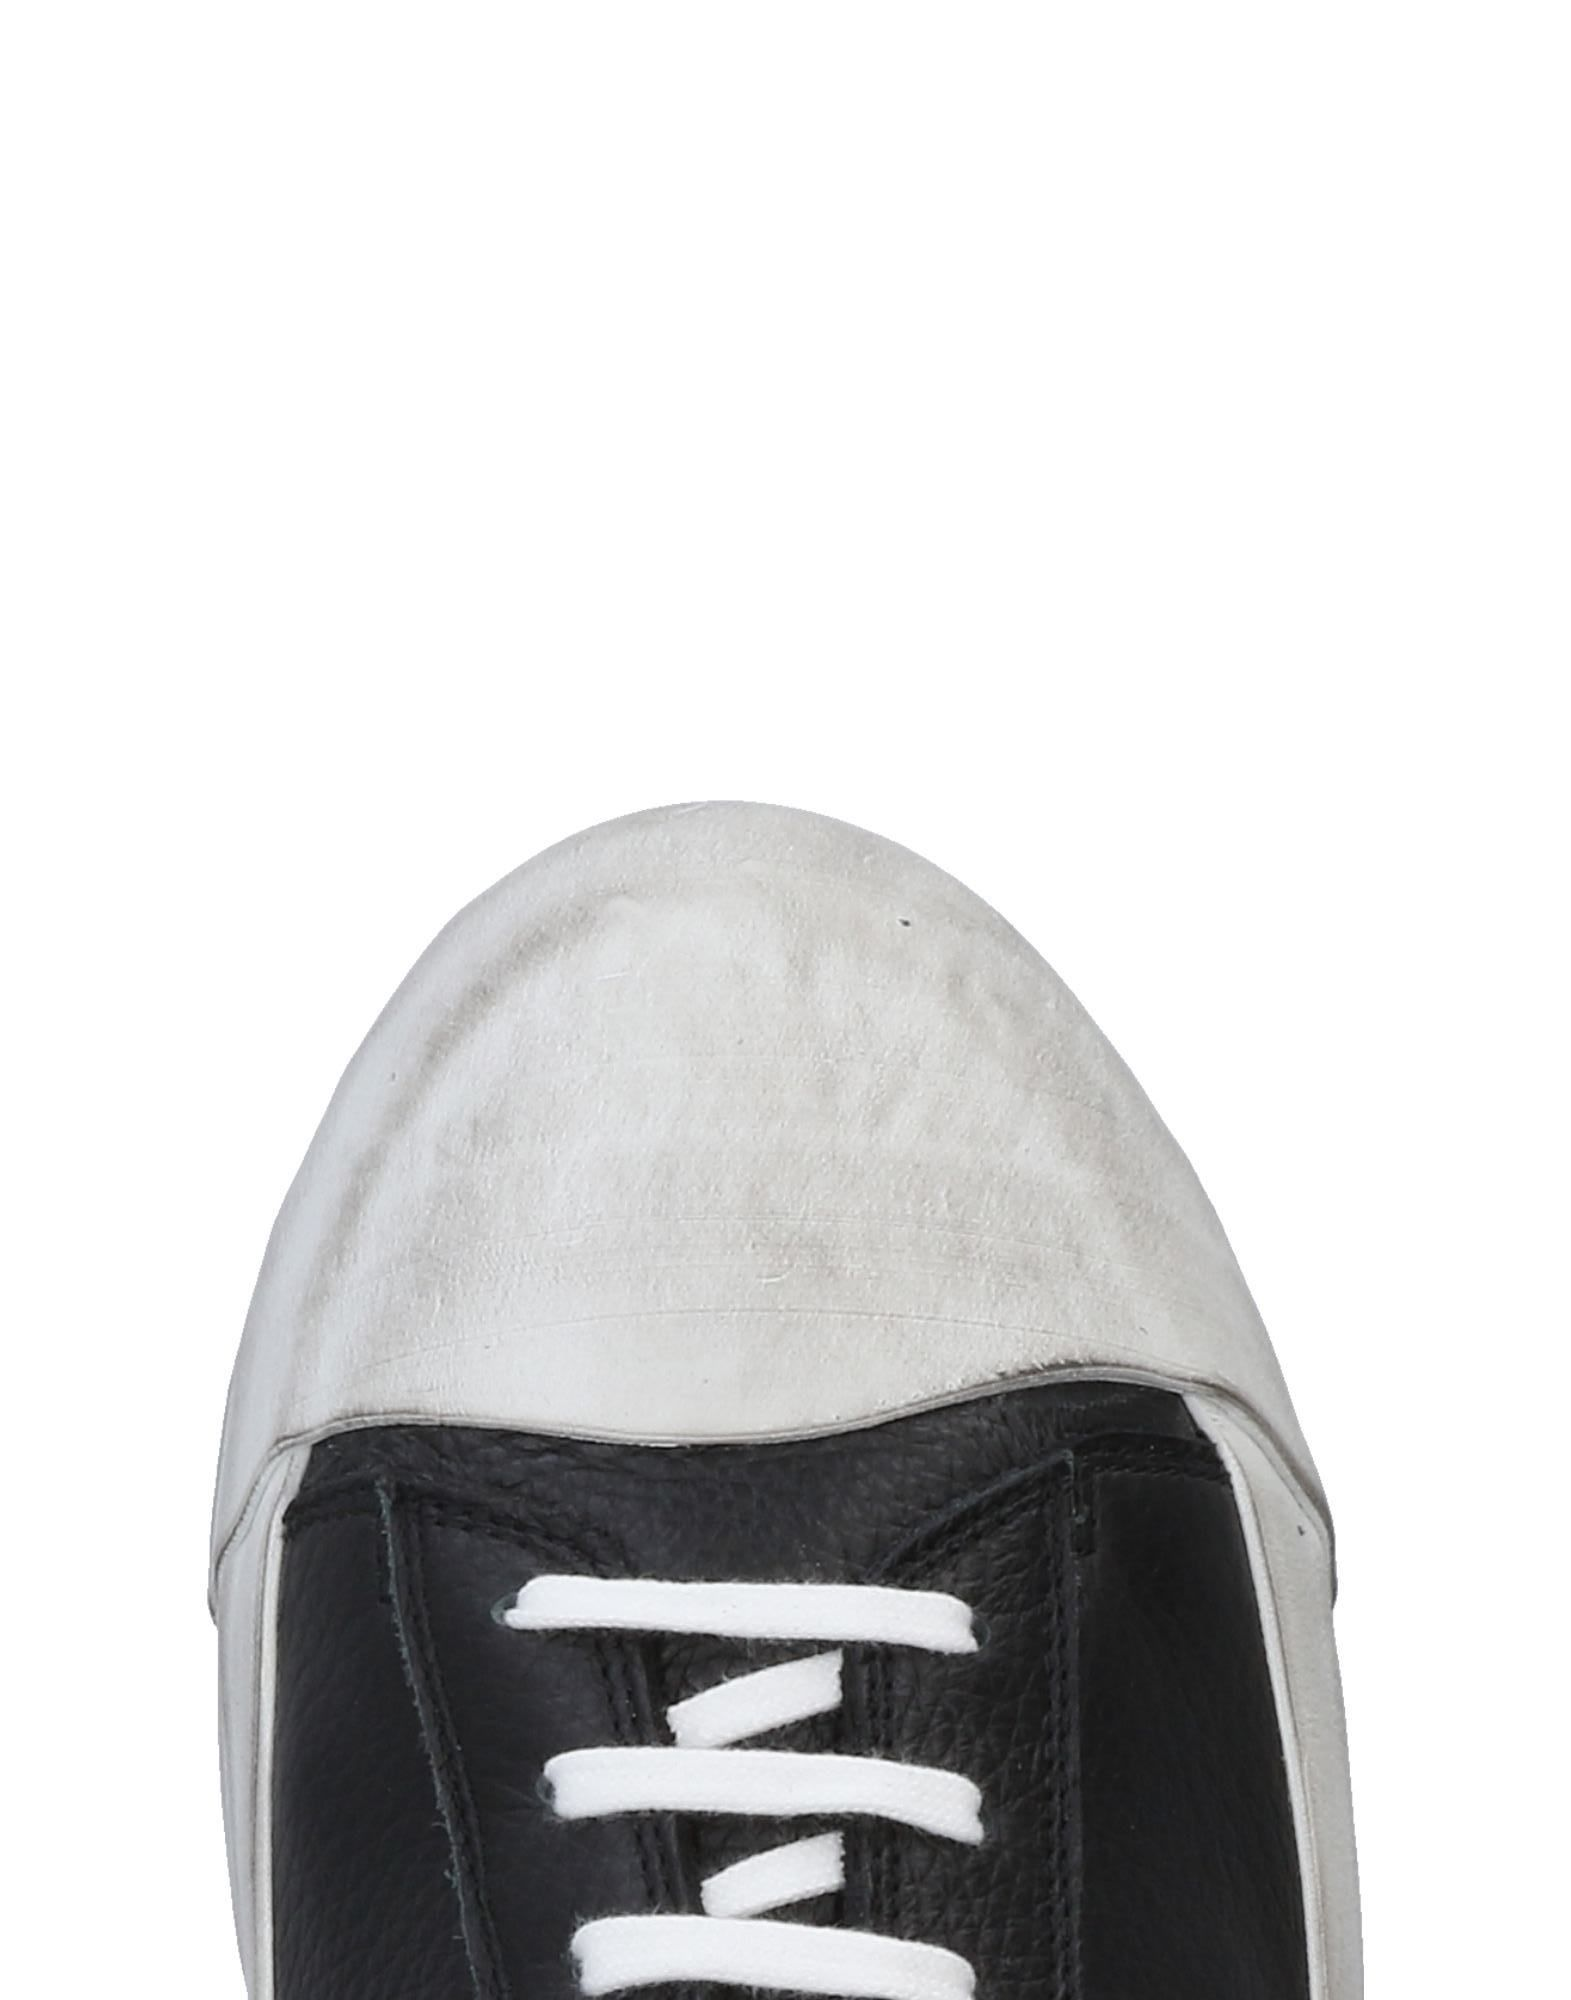 11455776TP O.X.S. Sneakers Herren  11455776TP  1cfd4e